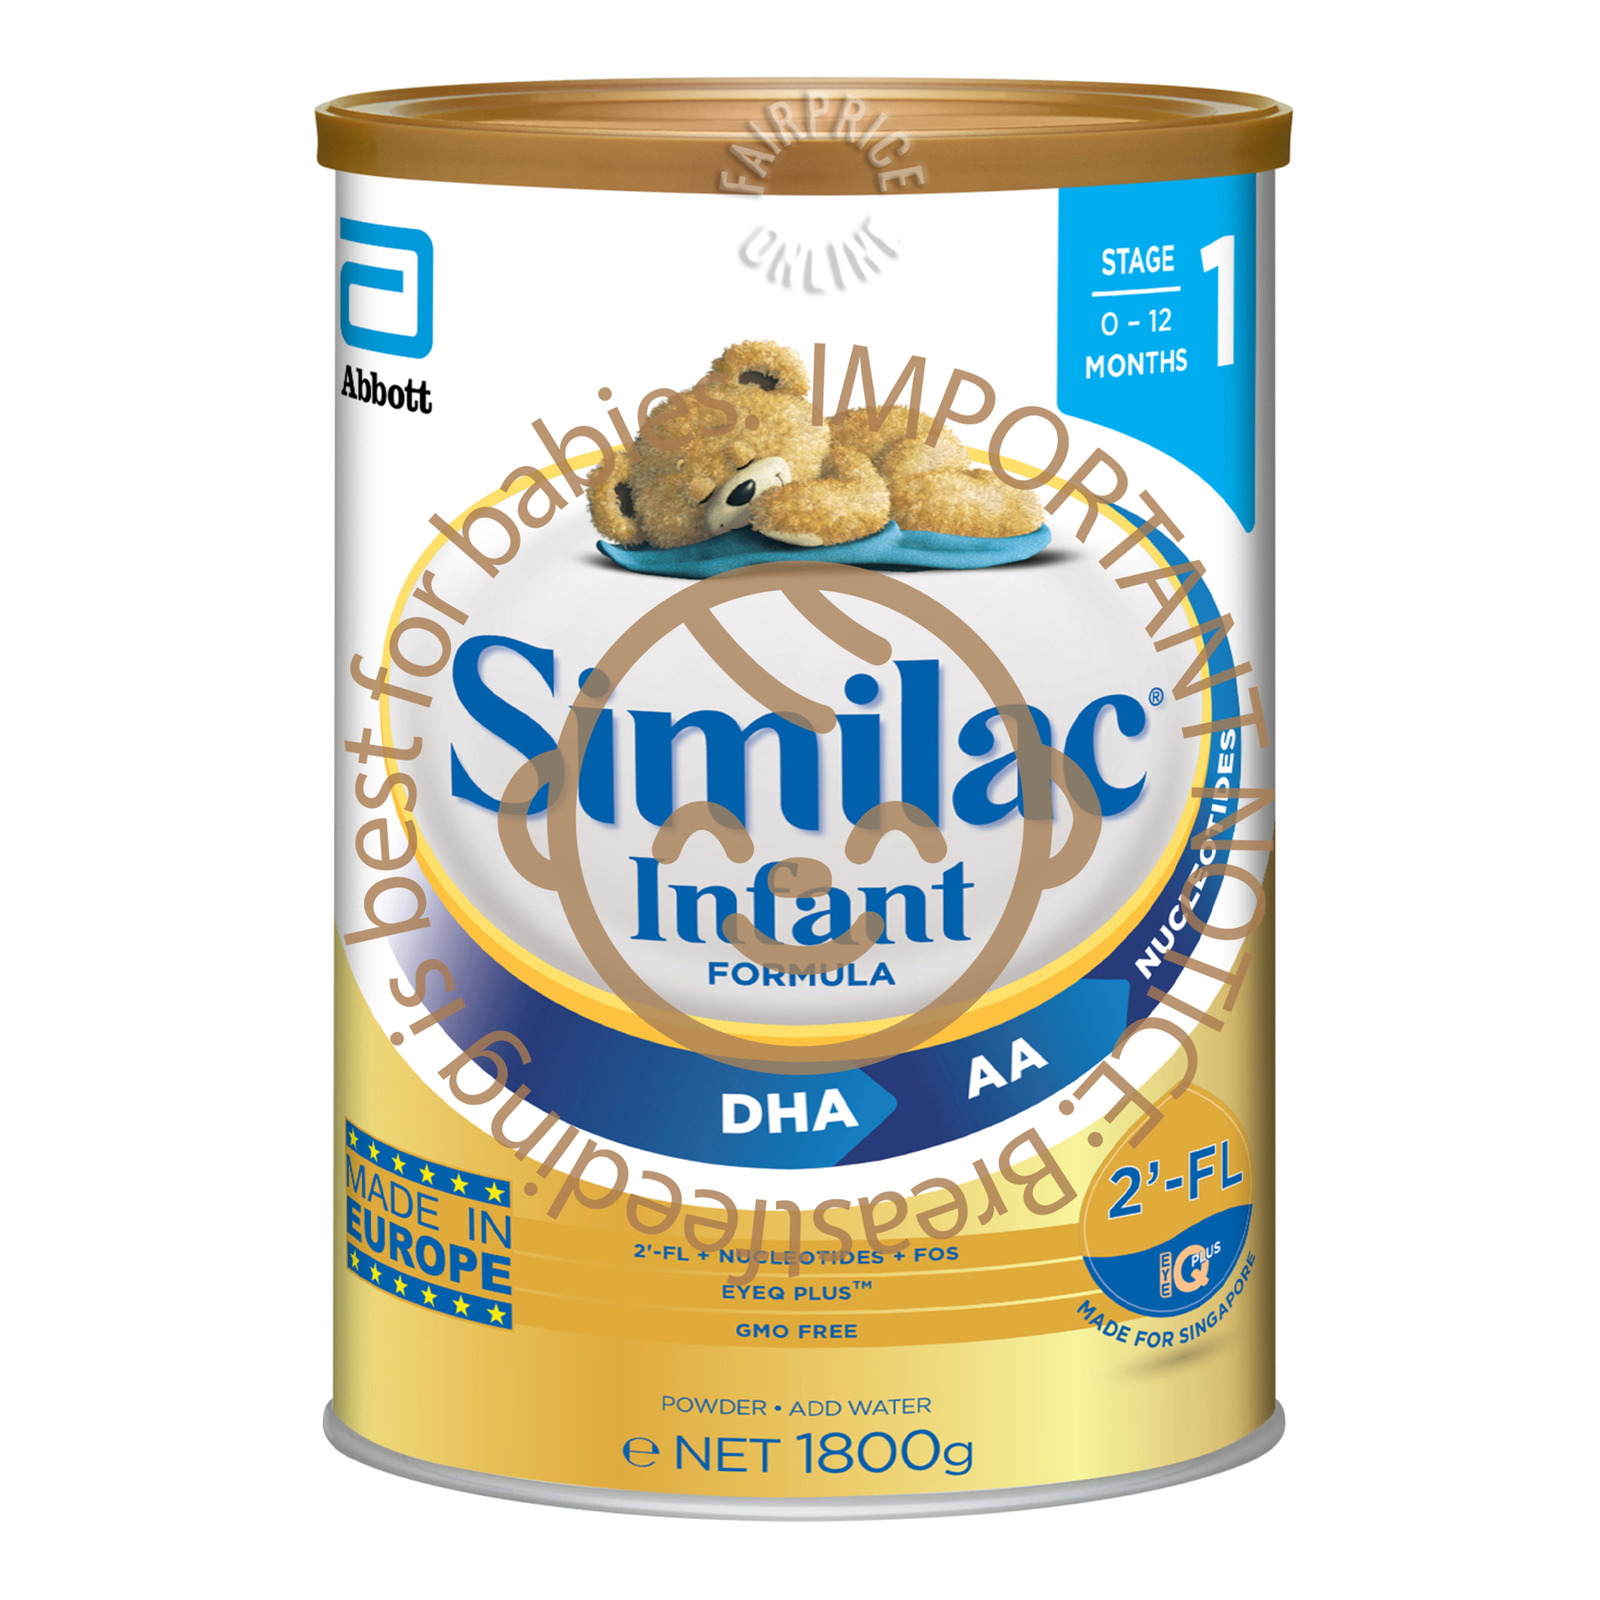 Abbott Similac Infant Milk Formula - Stage 1